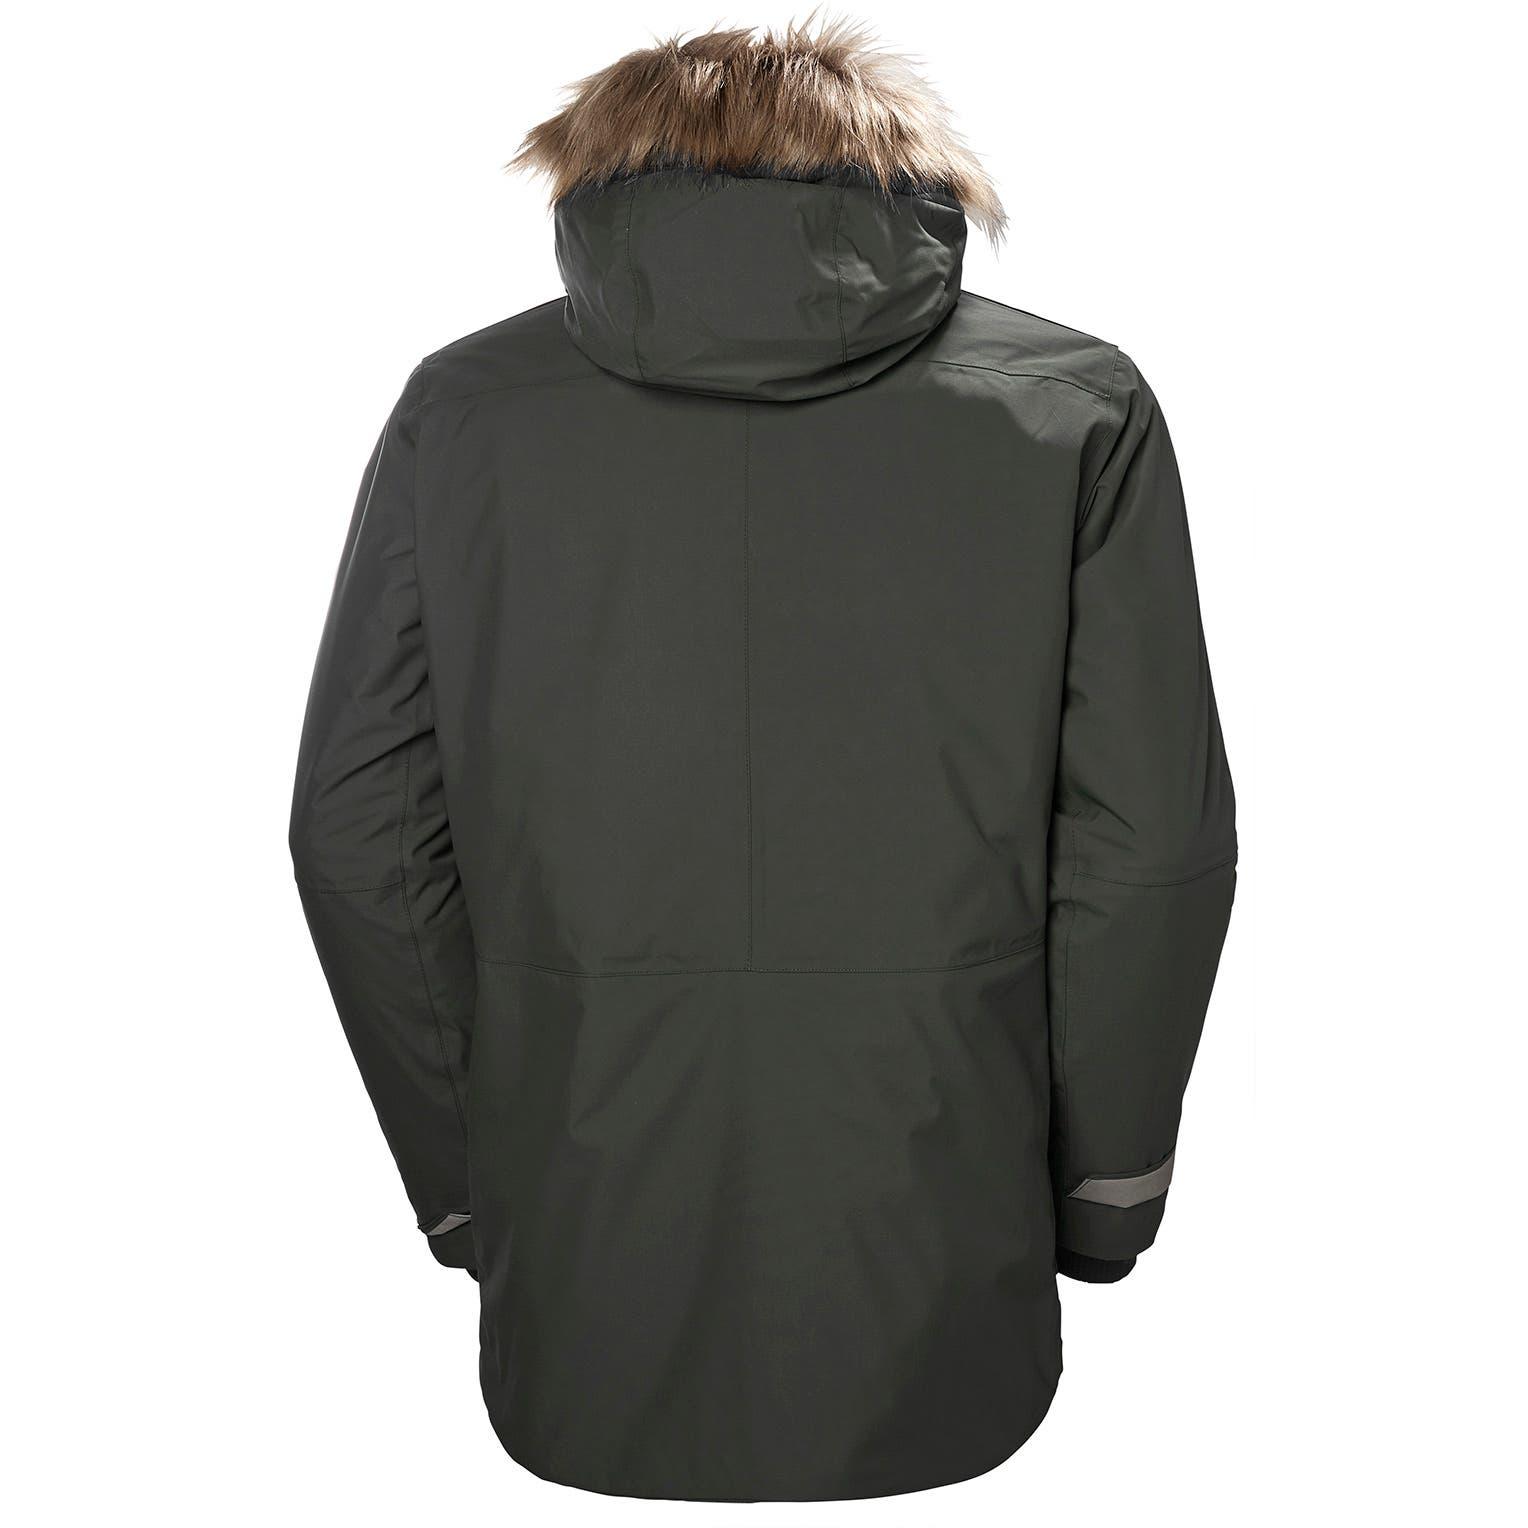 Helly Hansen Svalbard Parka jakke, beluga, x-large